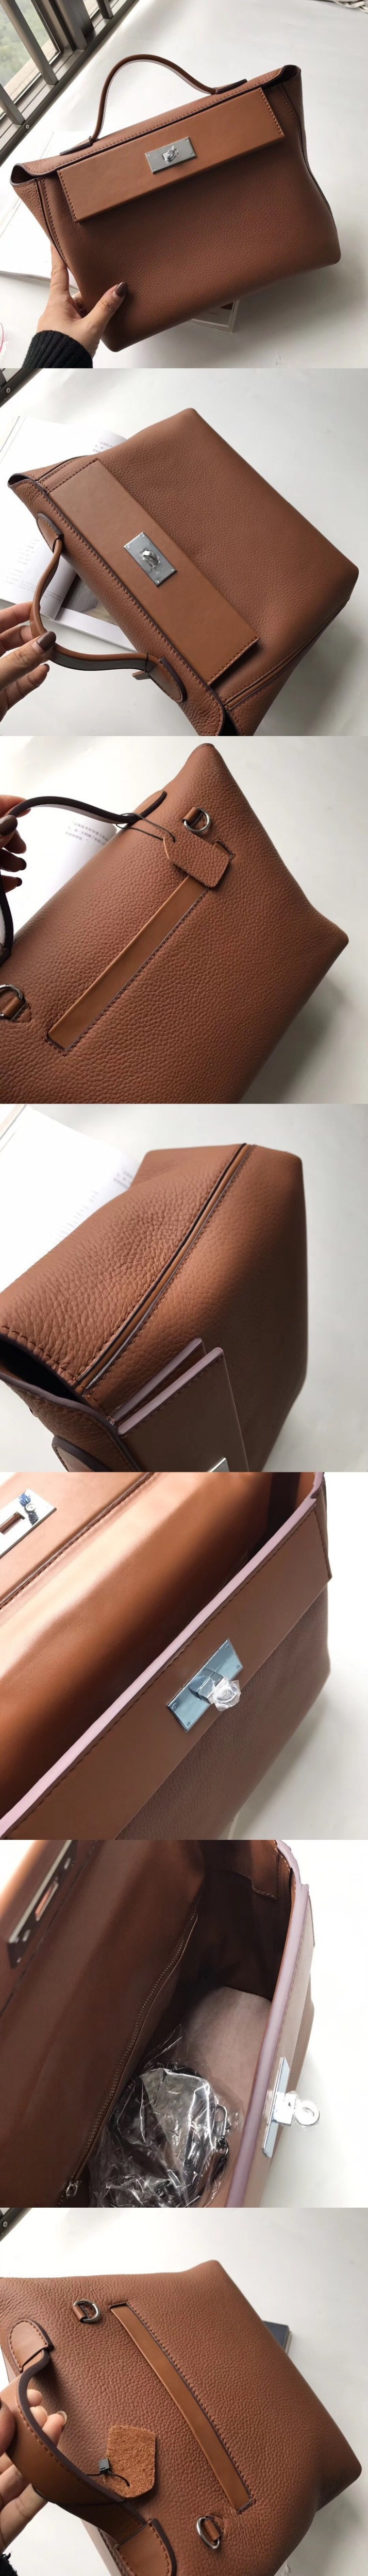 designer handbag luxury